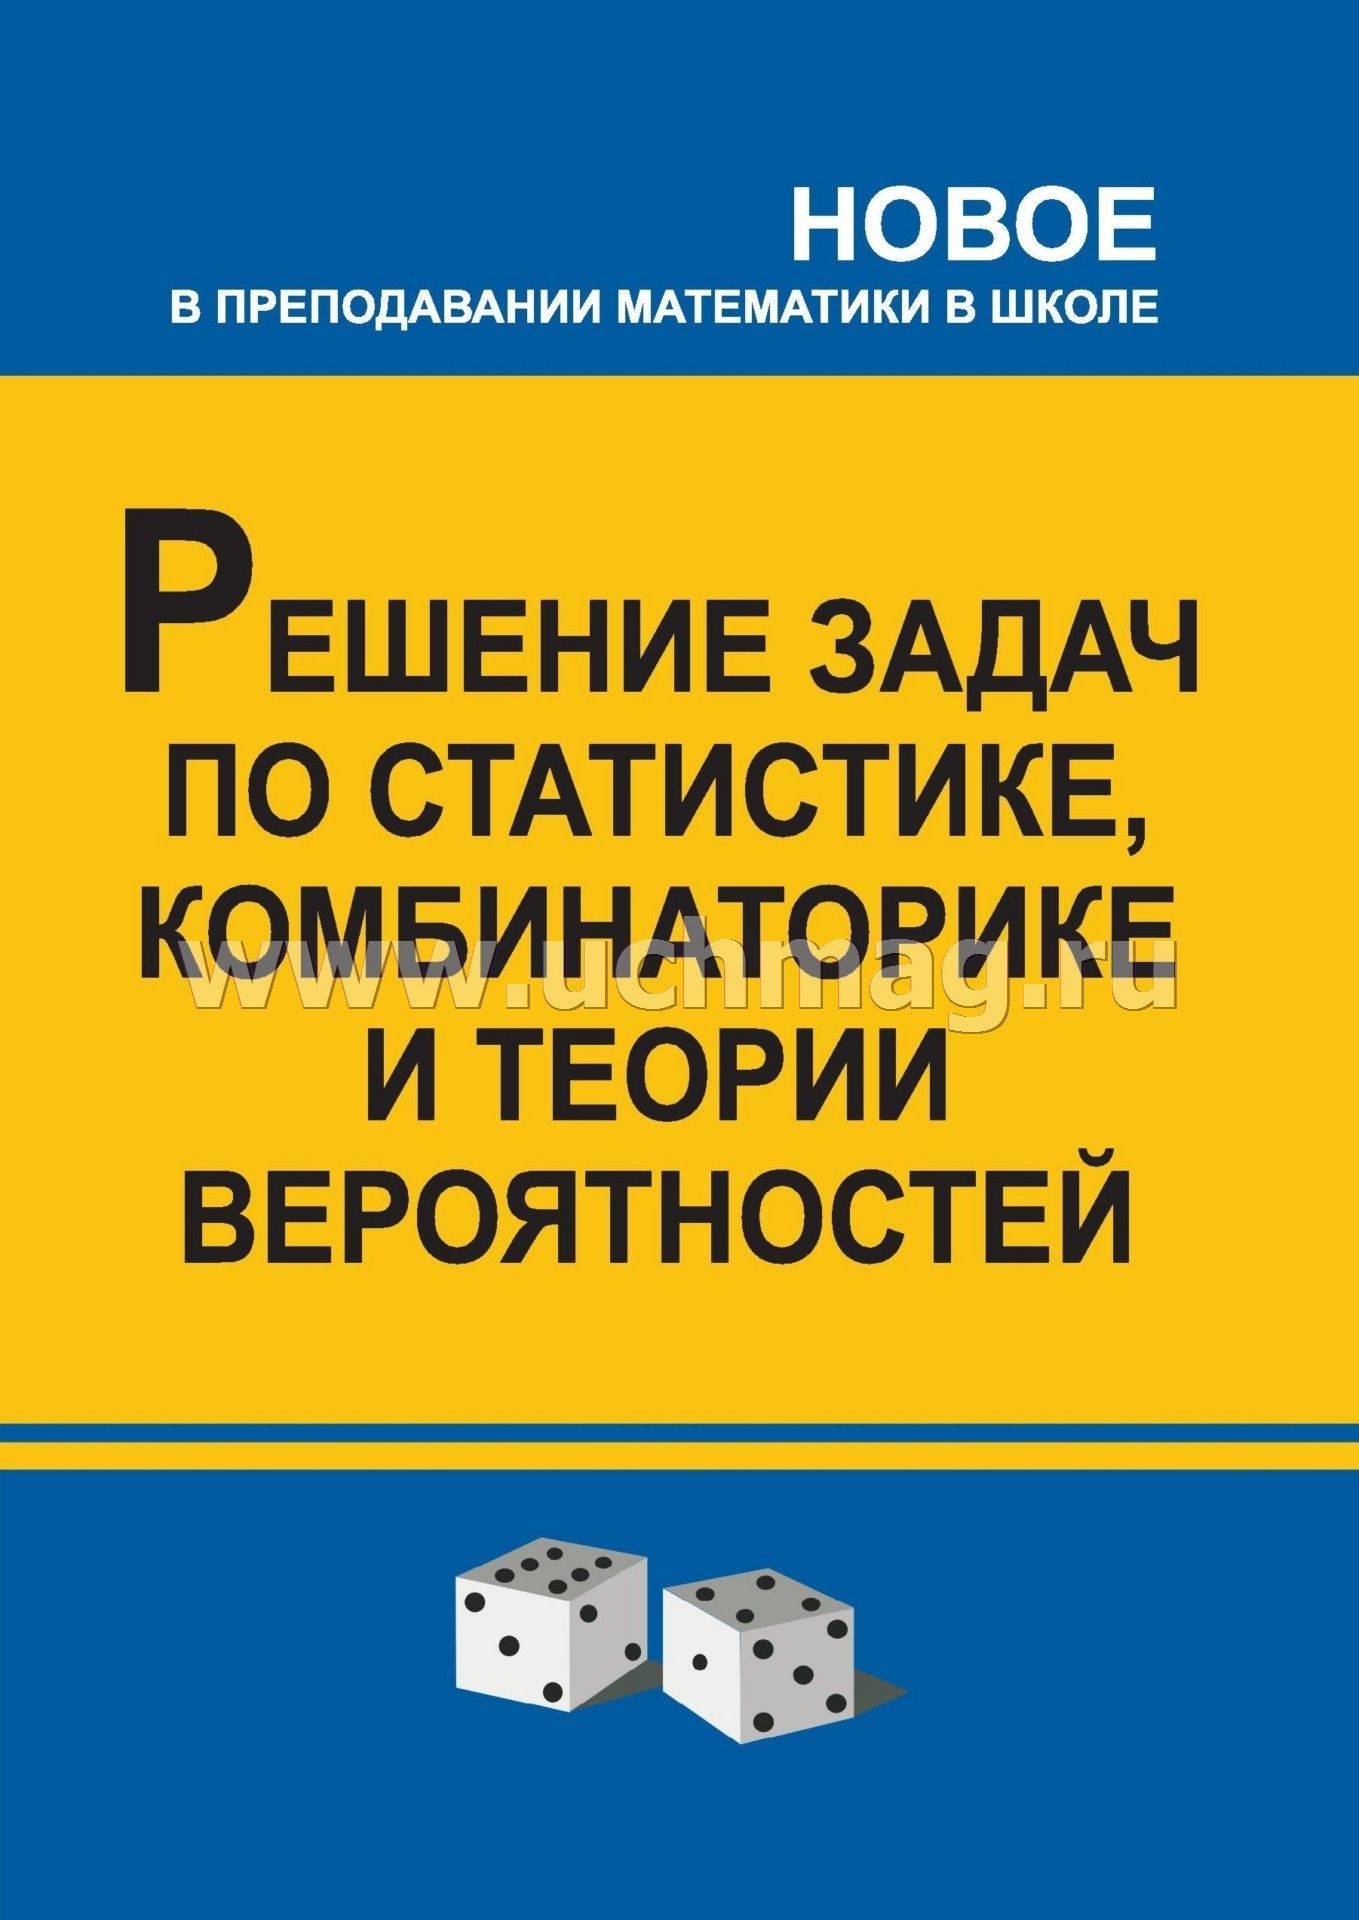 Решебник Практикум По Теории Вероятности С Элементами Комбинаторики Виленкин Потапов